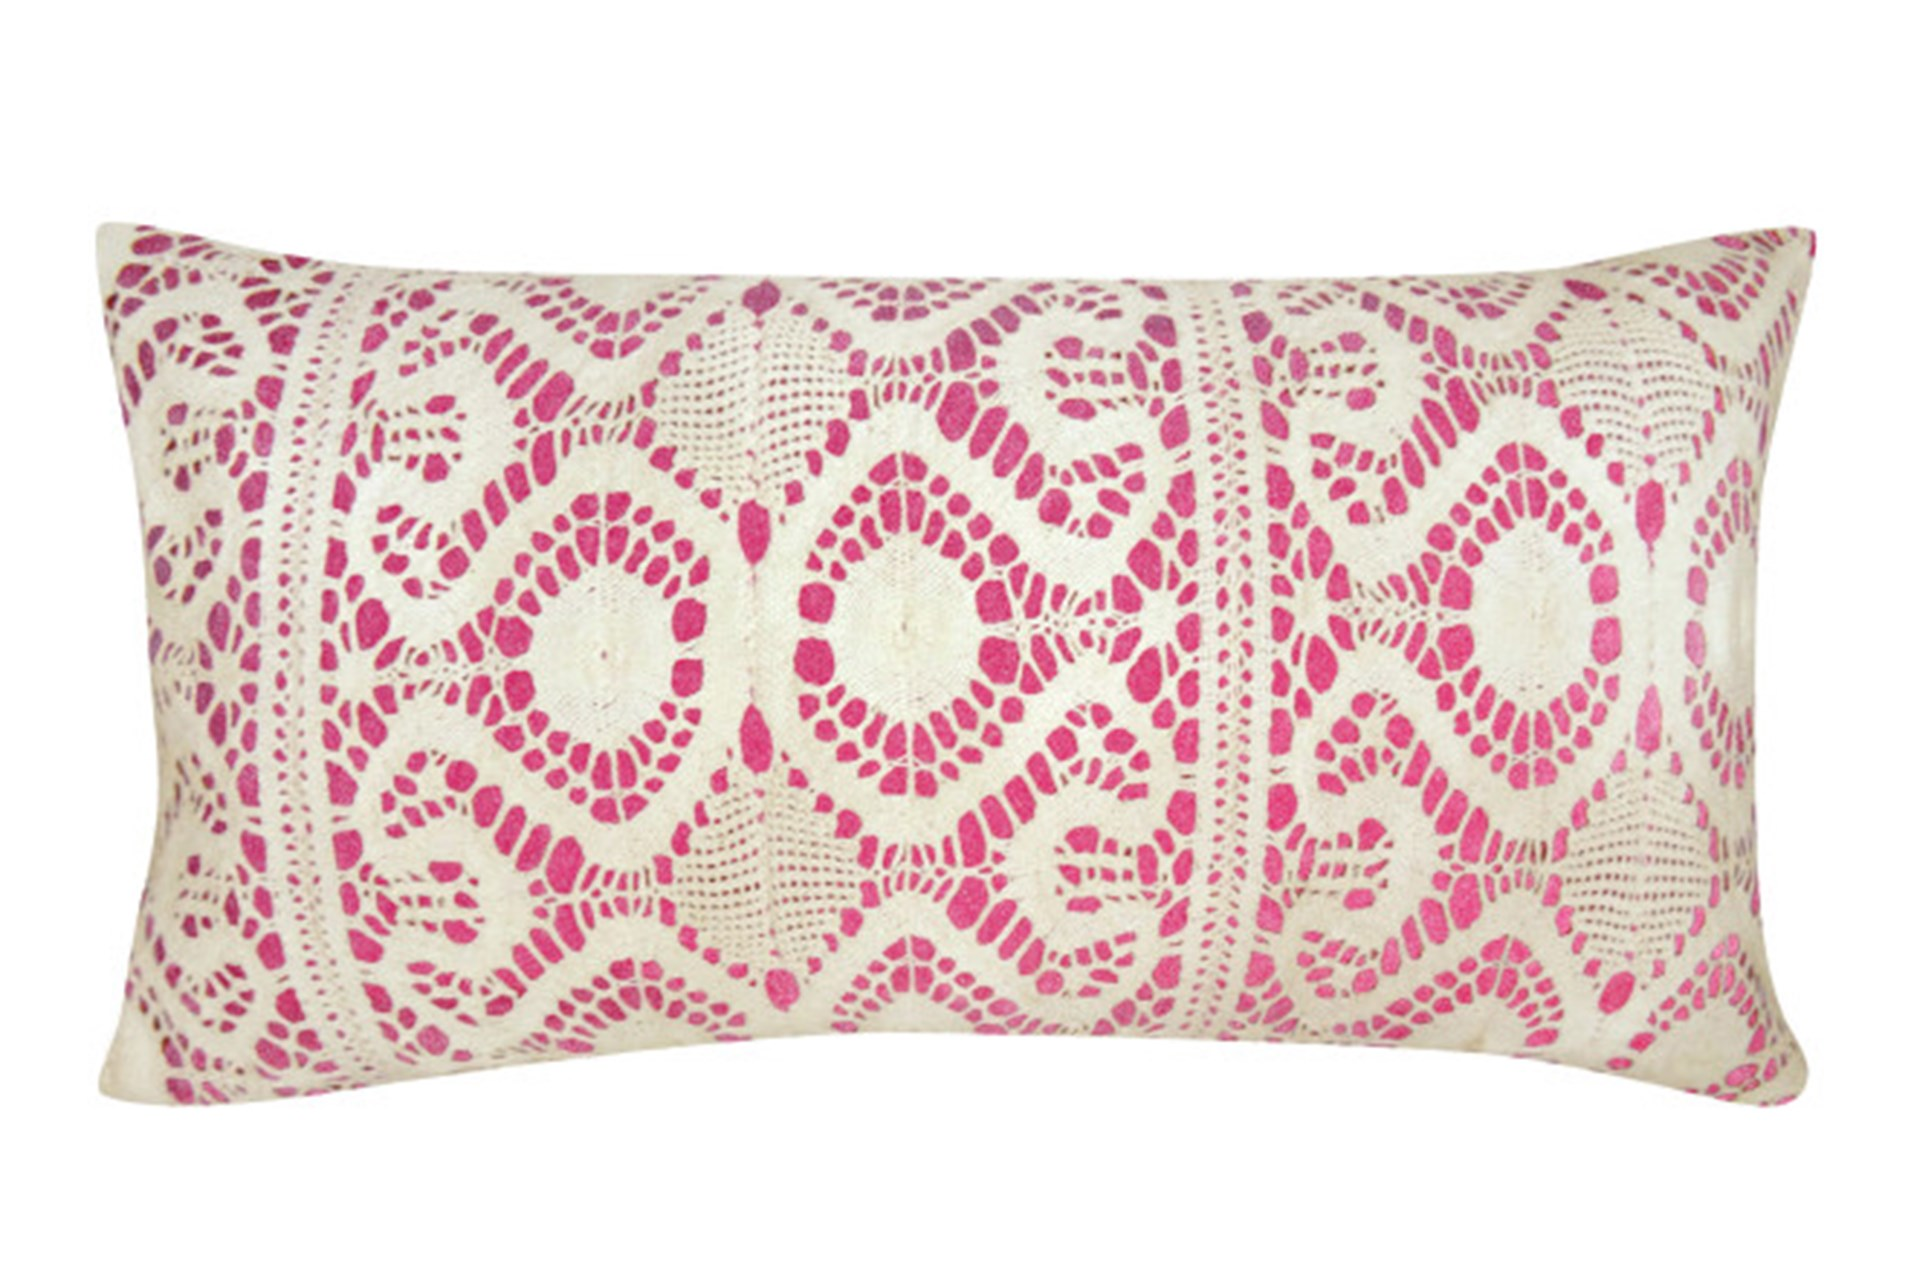 Decorative Pillows Living Spaces : Accent Pillow-Fuschia Lace 14X26 Living Spaces